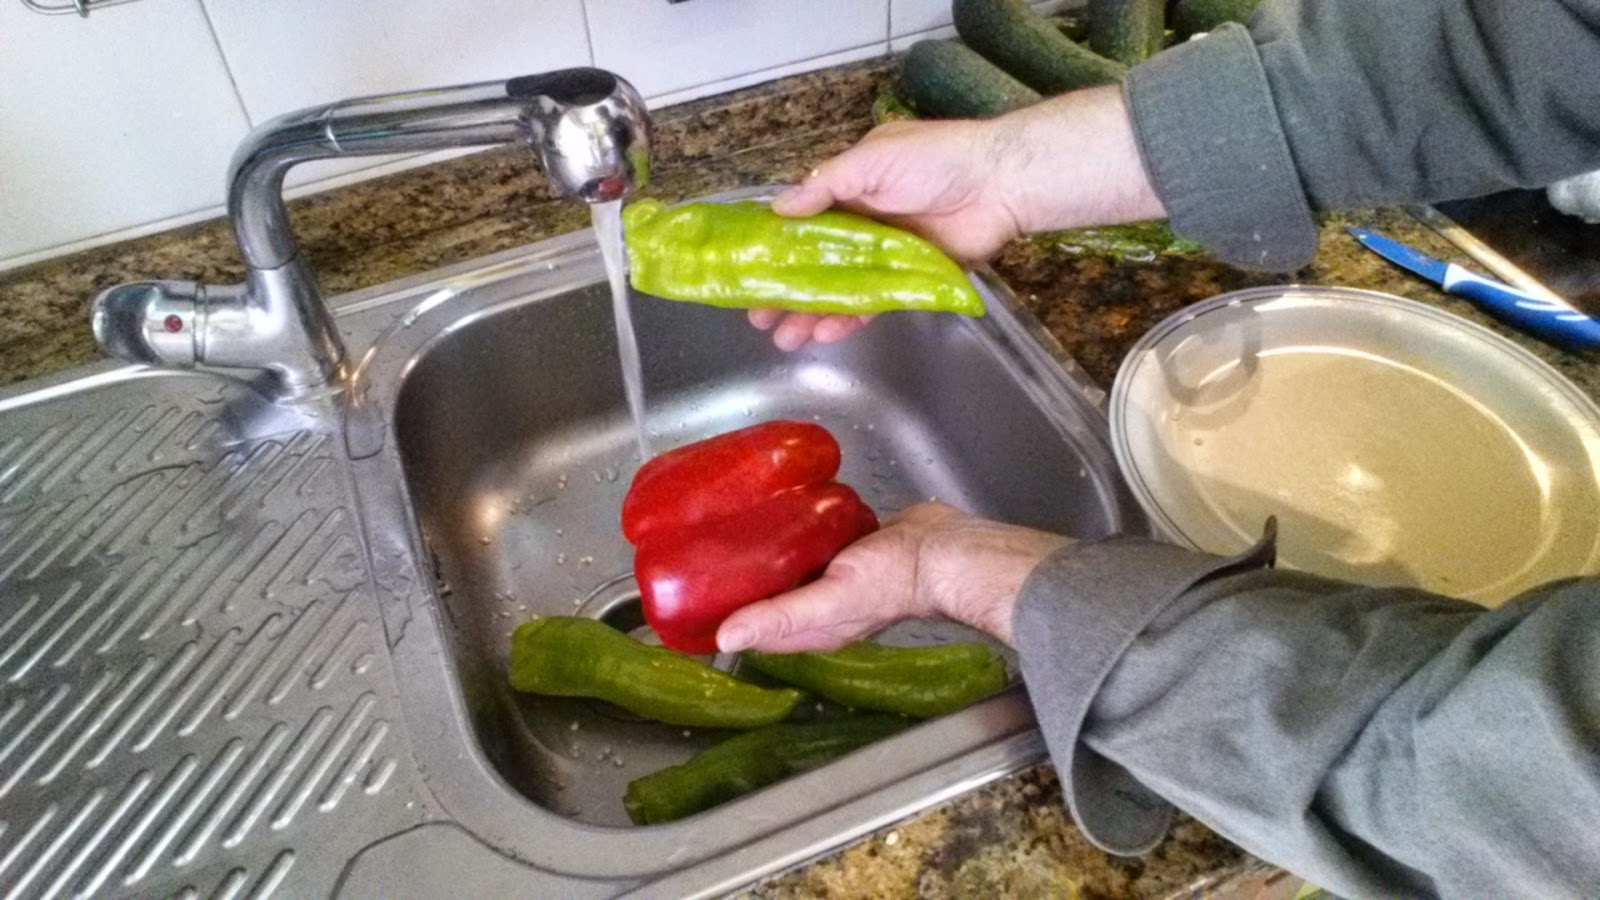 Gazpacho recerta tradicional riquisima la cocina for Cocina tradicional